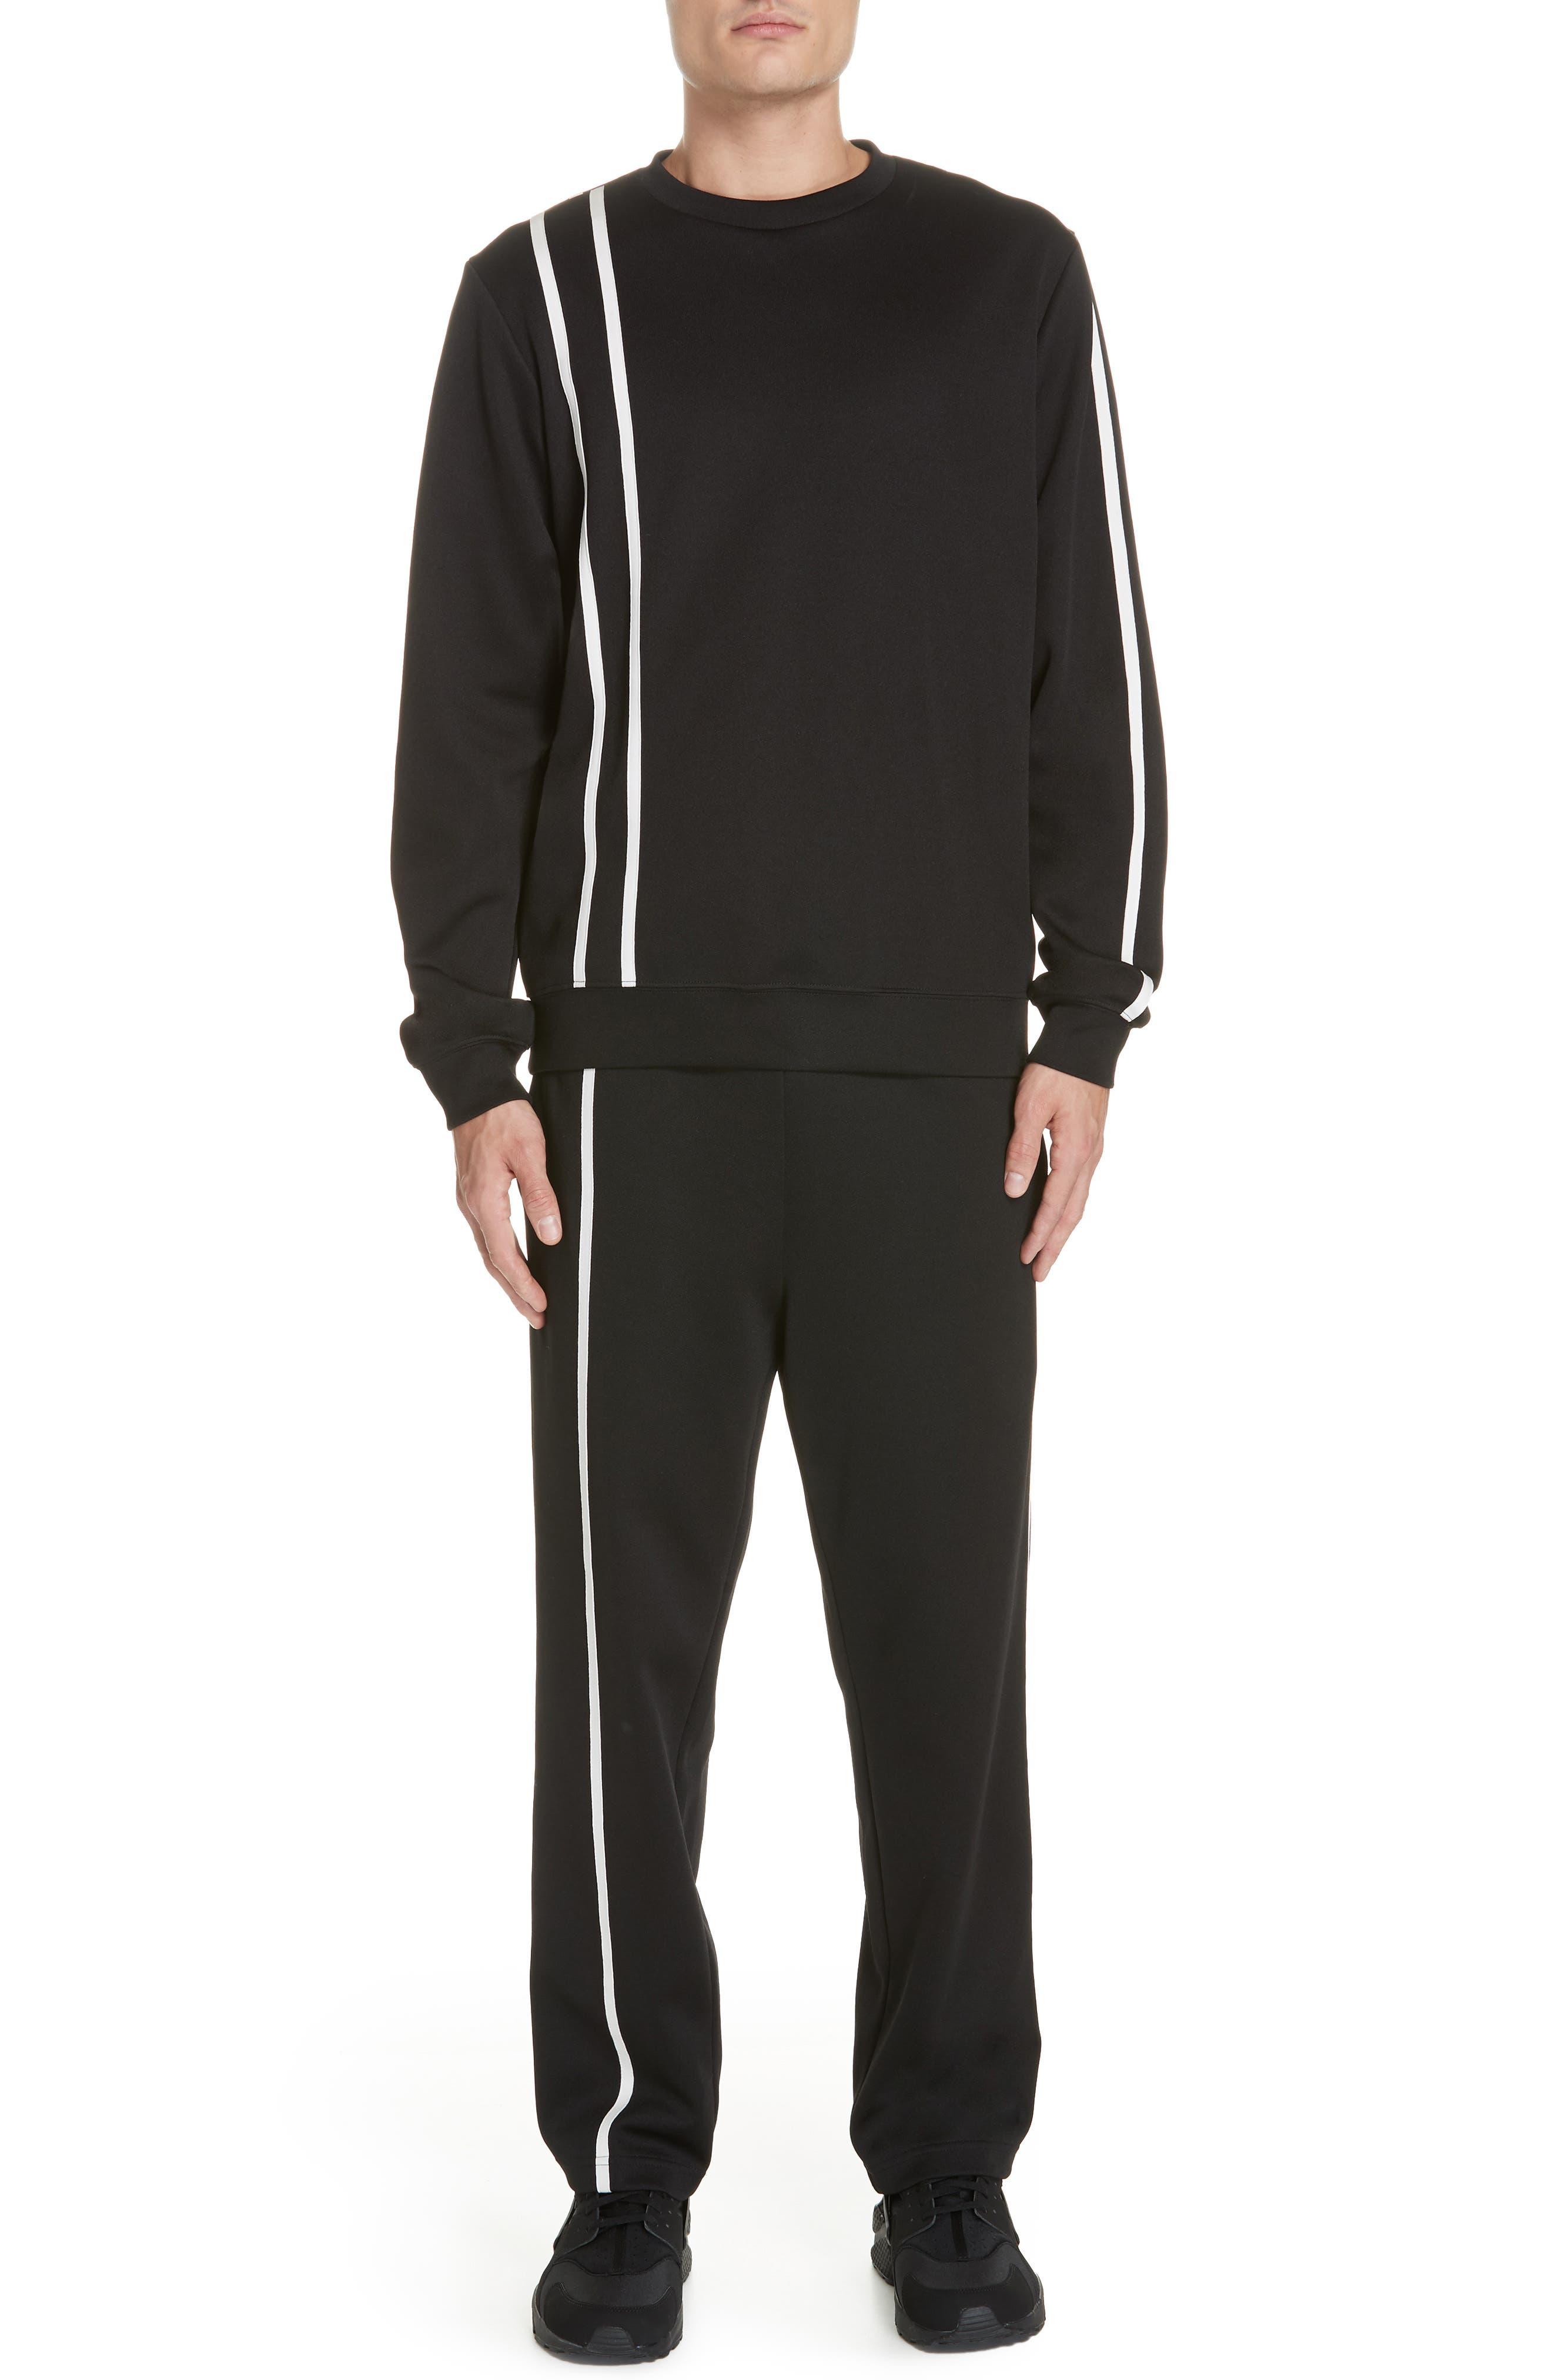 HELMUT LANG, Sport Stripe Sweatpants, Alternate thumbnail 7, color, BLACK AND WHITE